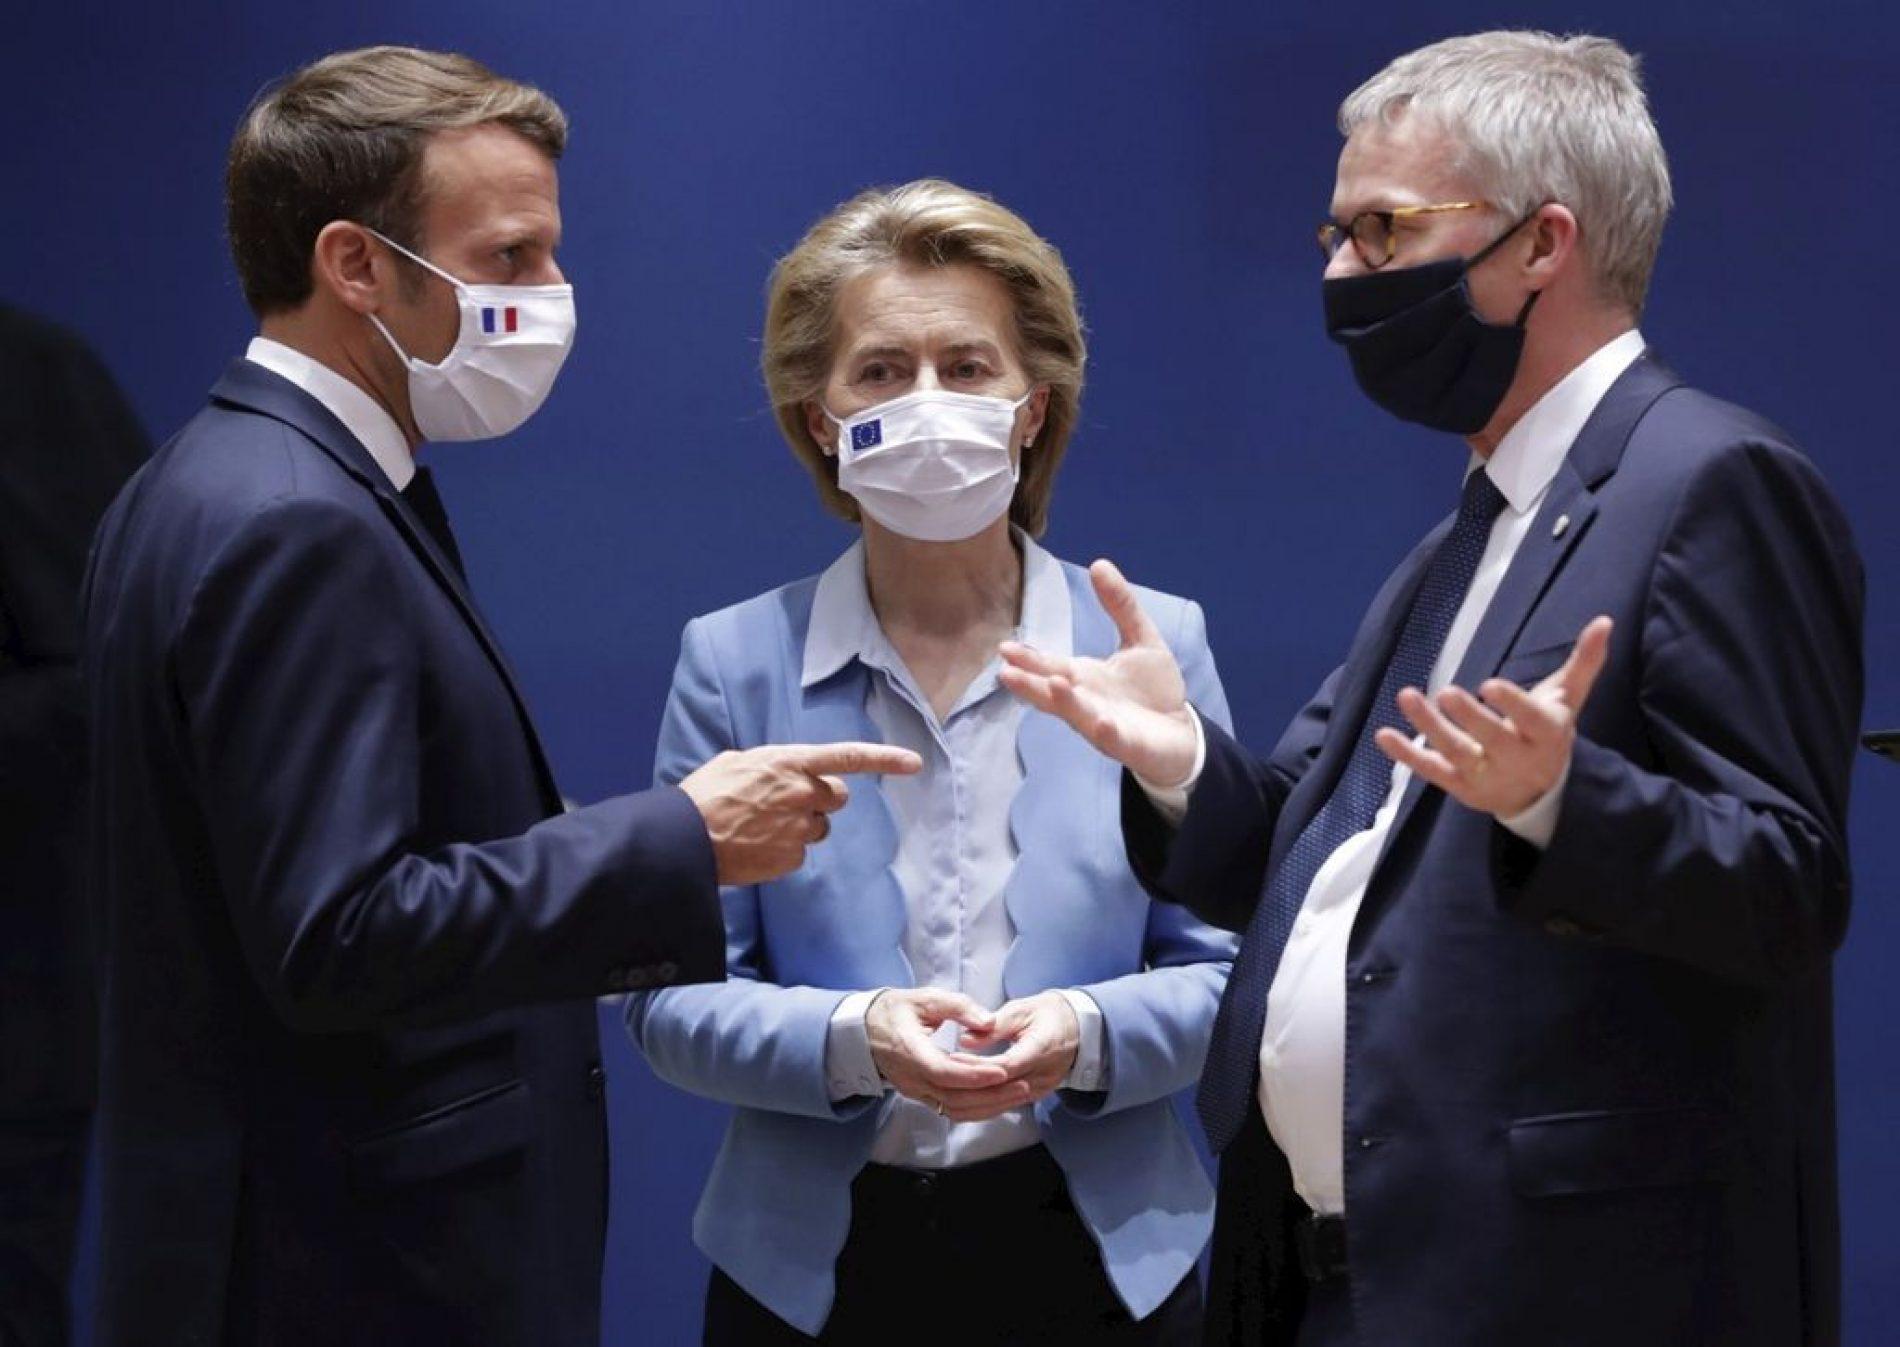 Plan Européen de relance: Les 27 enfin d'accord!